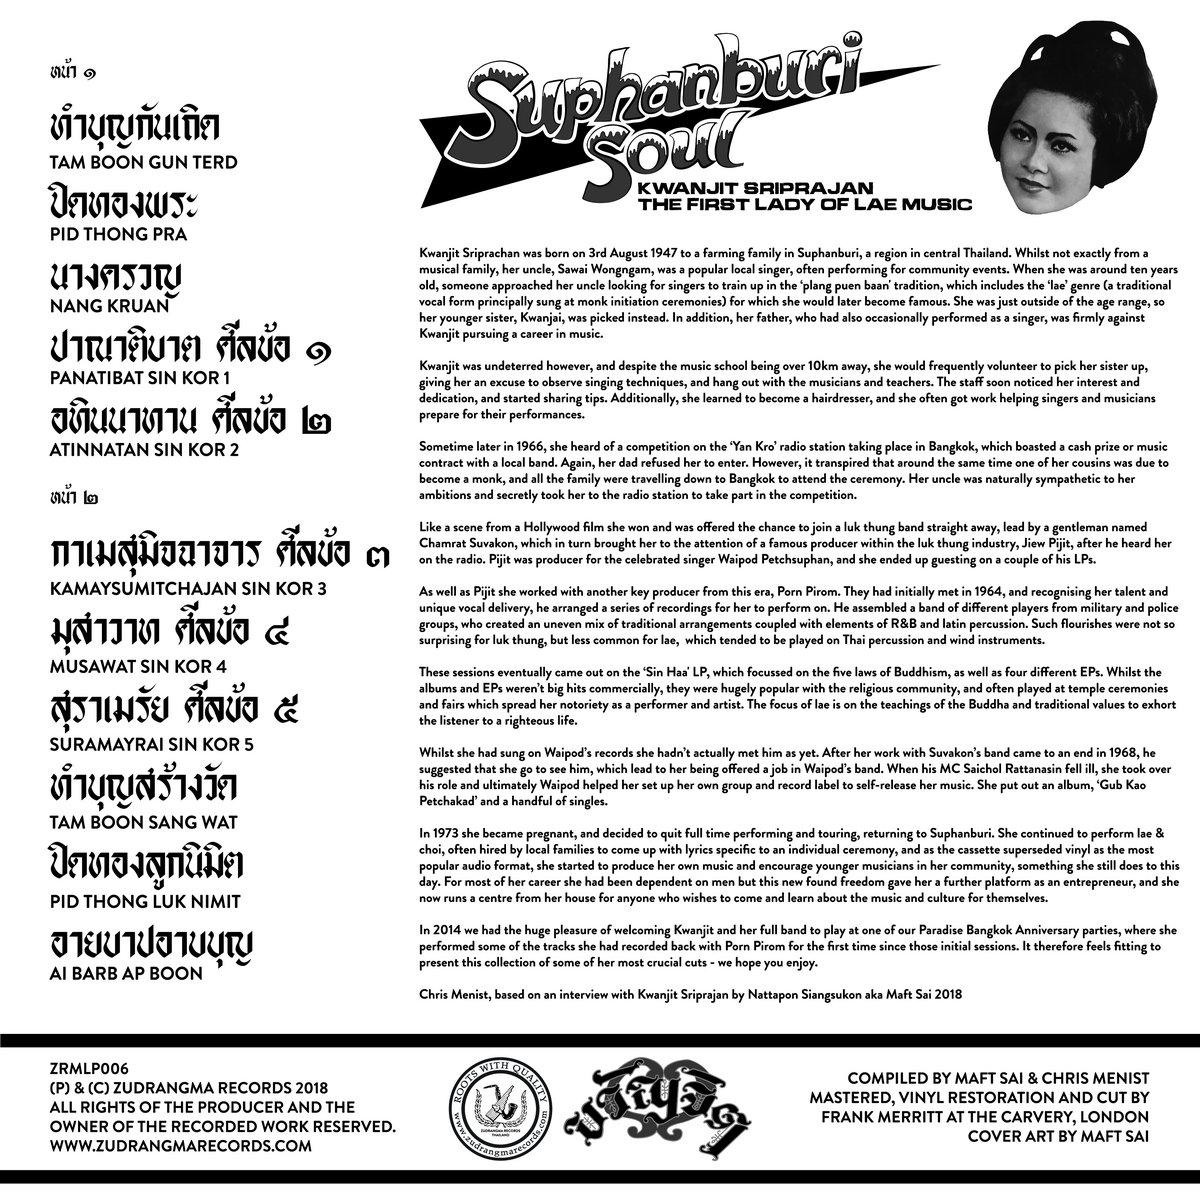 Suphanburi Soul : Kwanjit Sriprajan - The First Lady Of Lae